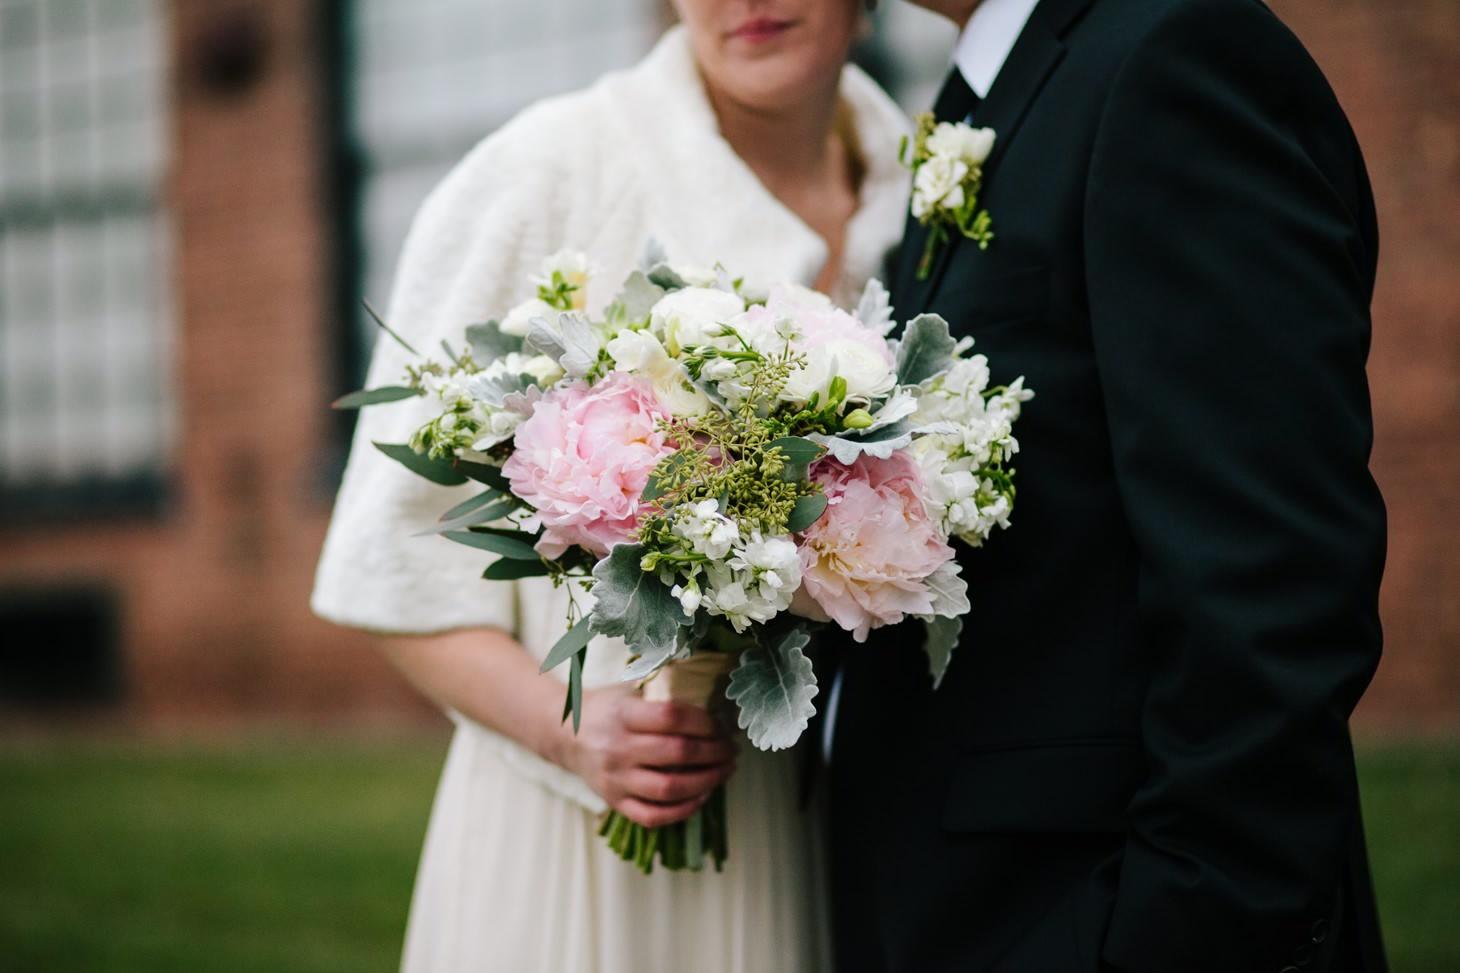 020-nyc-wedding-photographer-beacon-roundhouse-.jpg